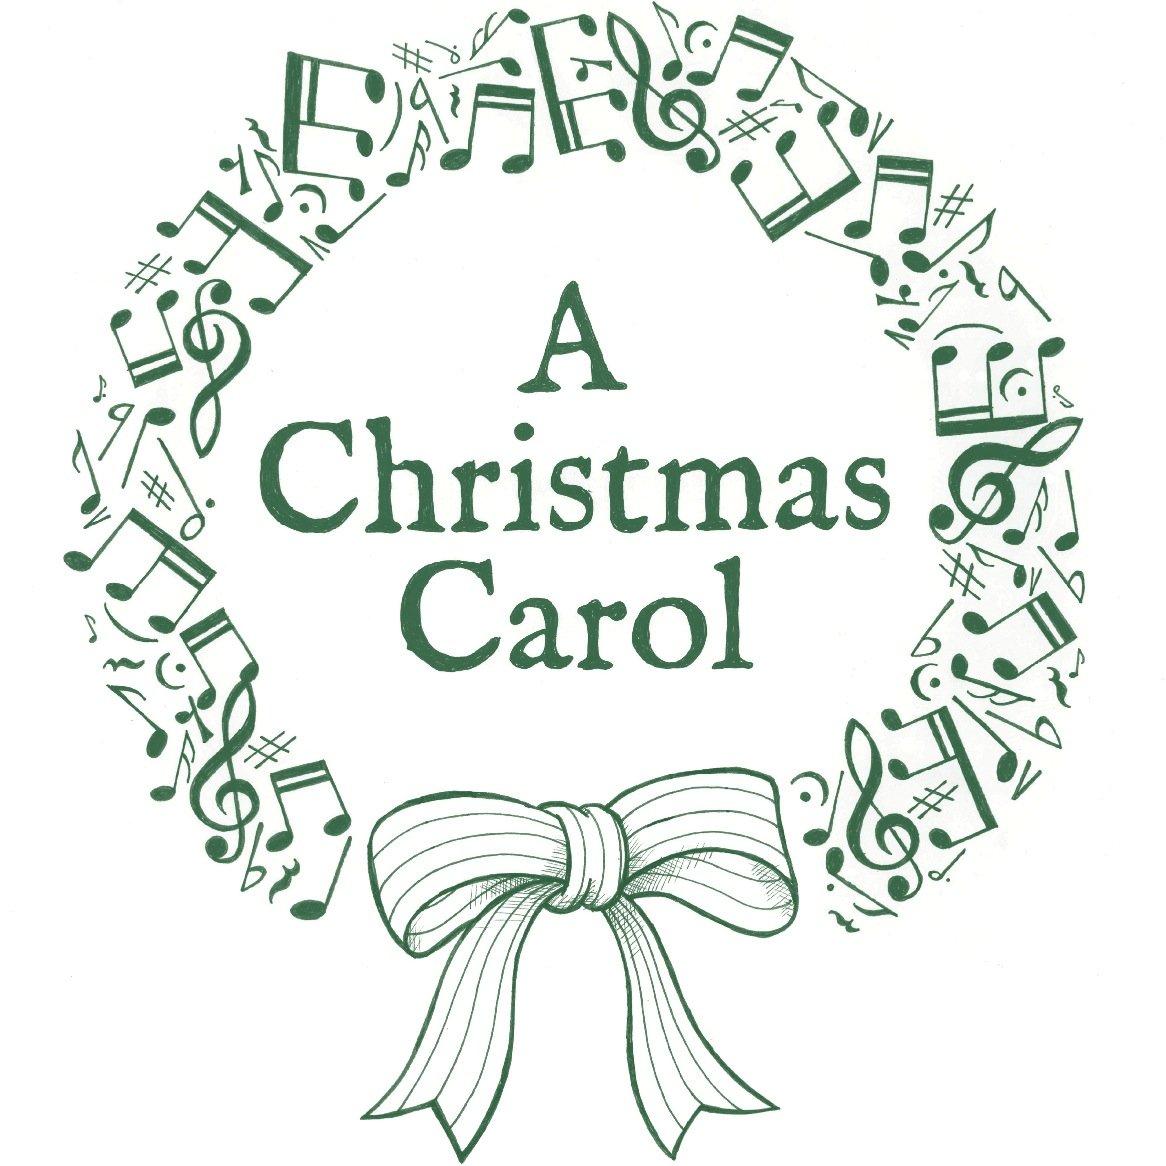 a christmas carol carolcantata twitter a christmas carol